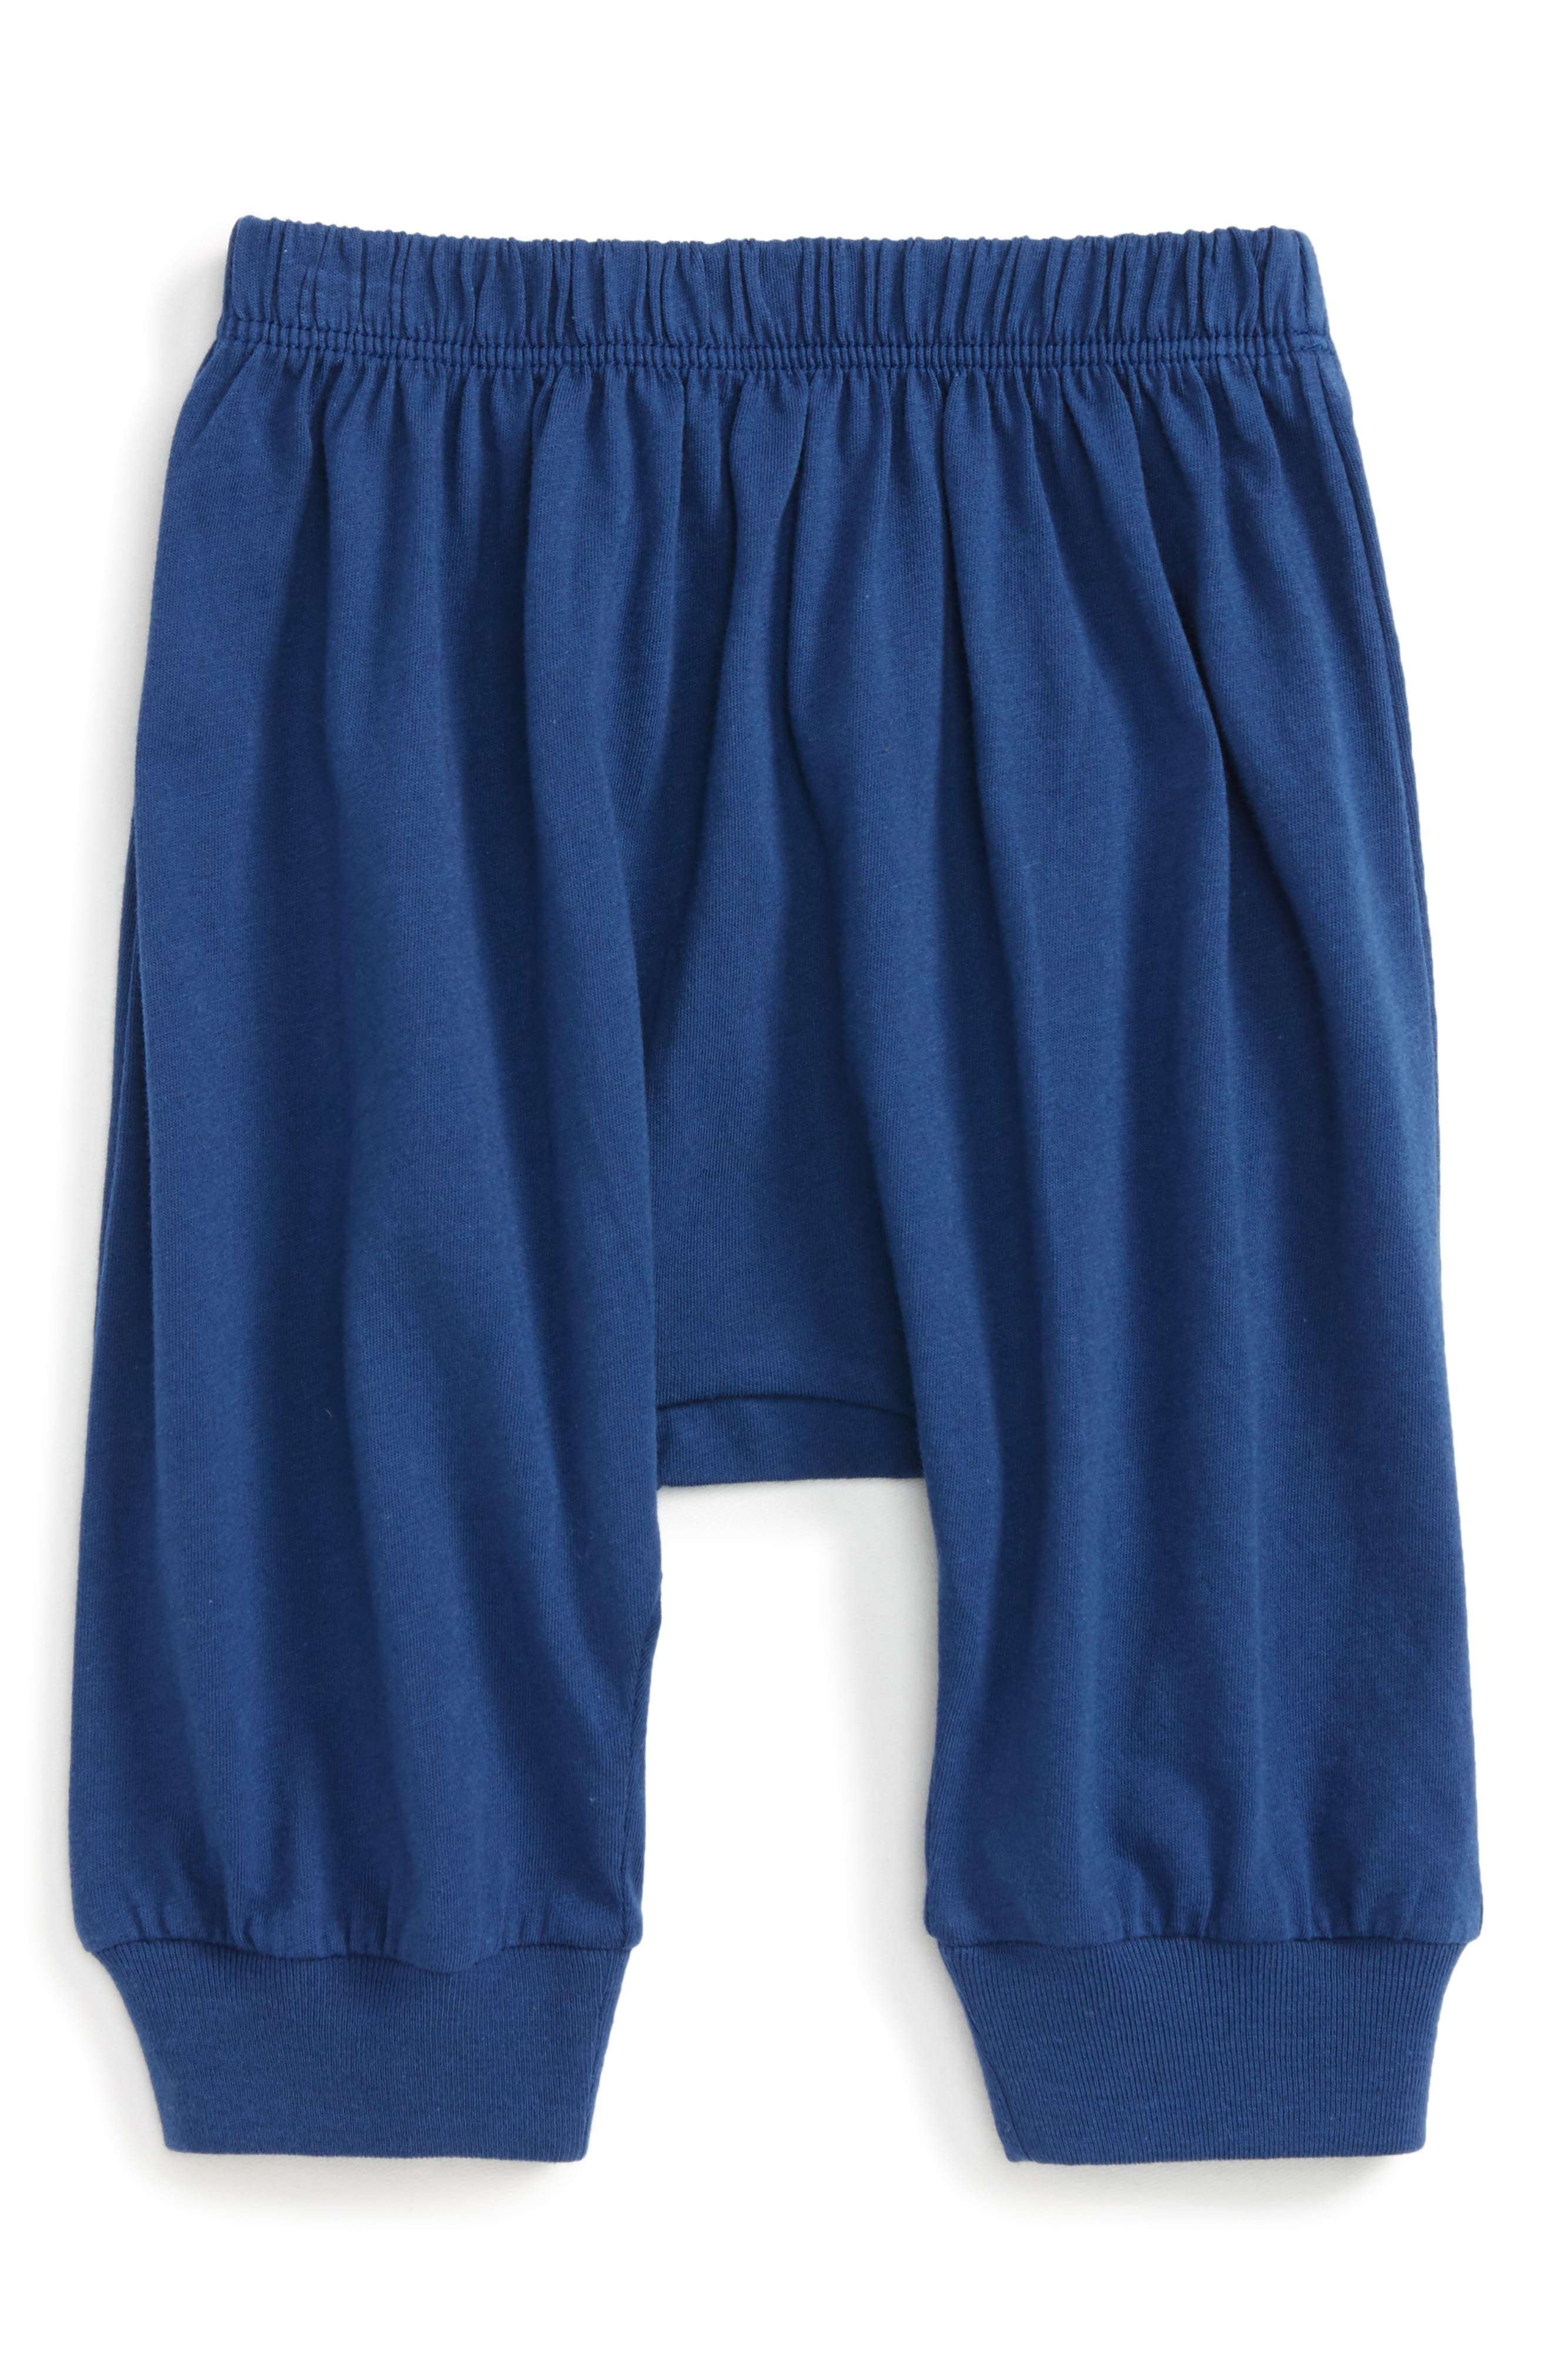 Peek Little Peanut Happy Pants,                         Main,                         color, Navy